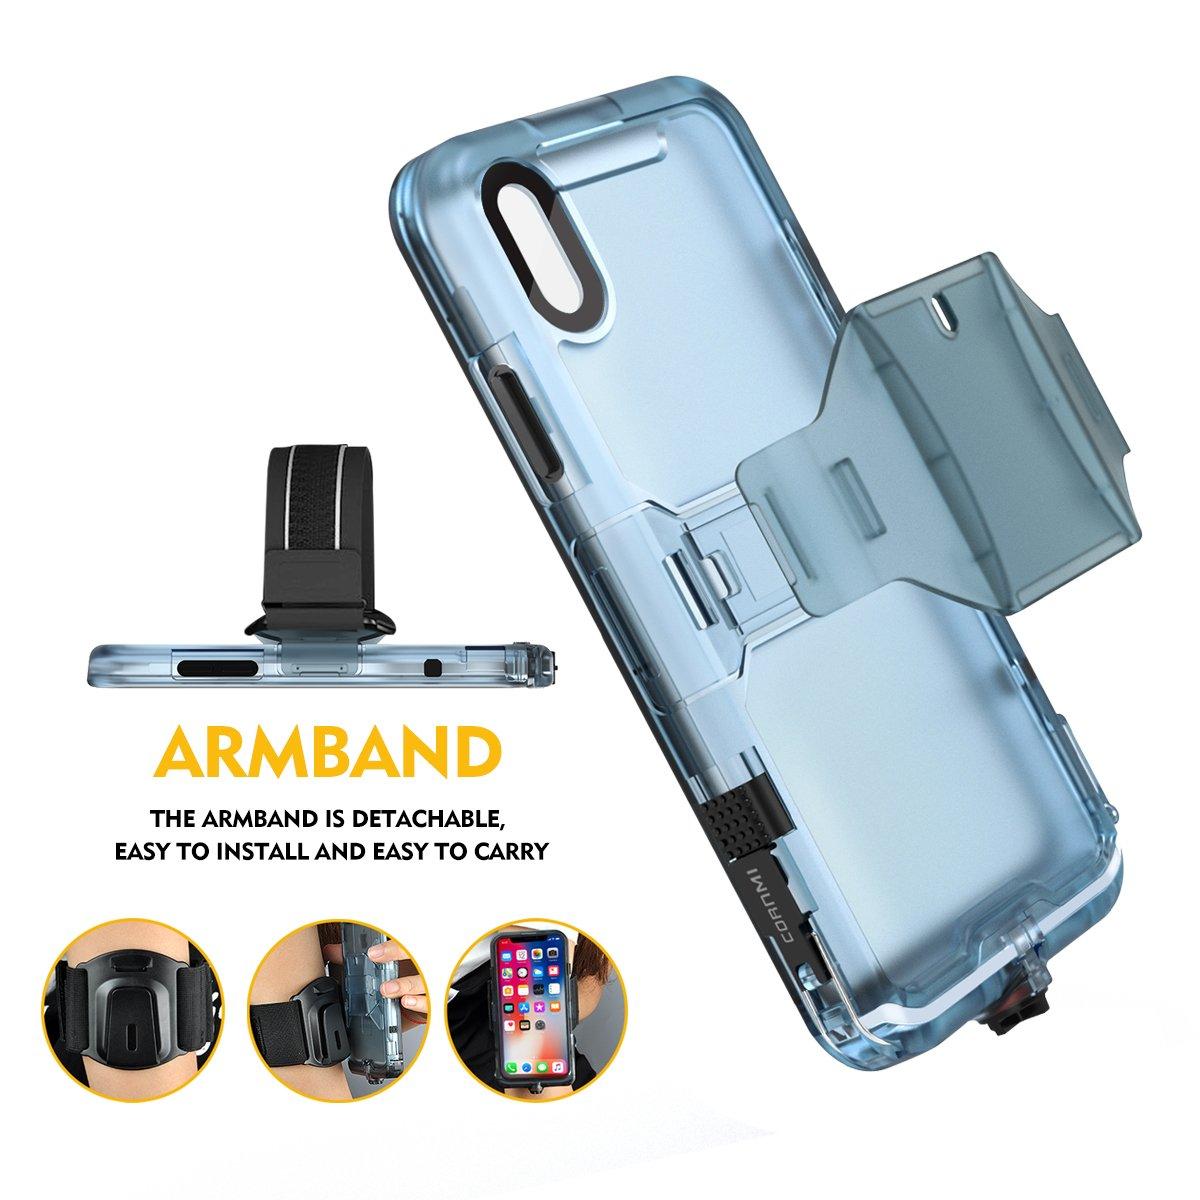 Cornmi iPhone X Waterproof Case, Full Sealed IP68 Certified Waterproof Shockproof Snowproof Protection Underwater Case for iPhone X 5.2inch (Black) by Cornmi (Image #5)